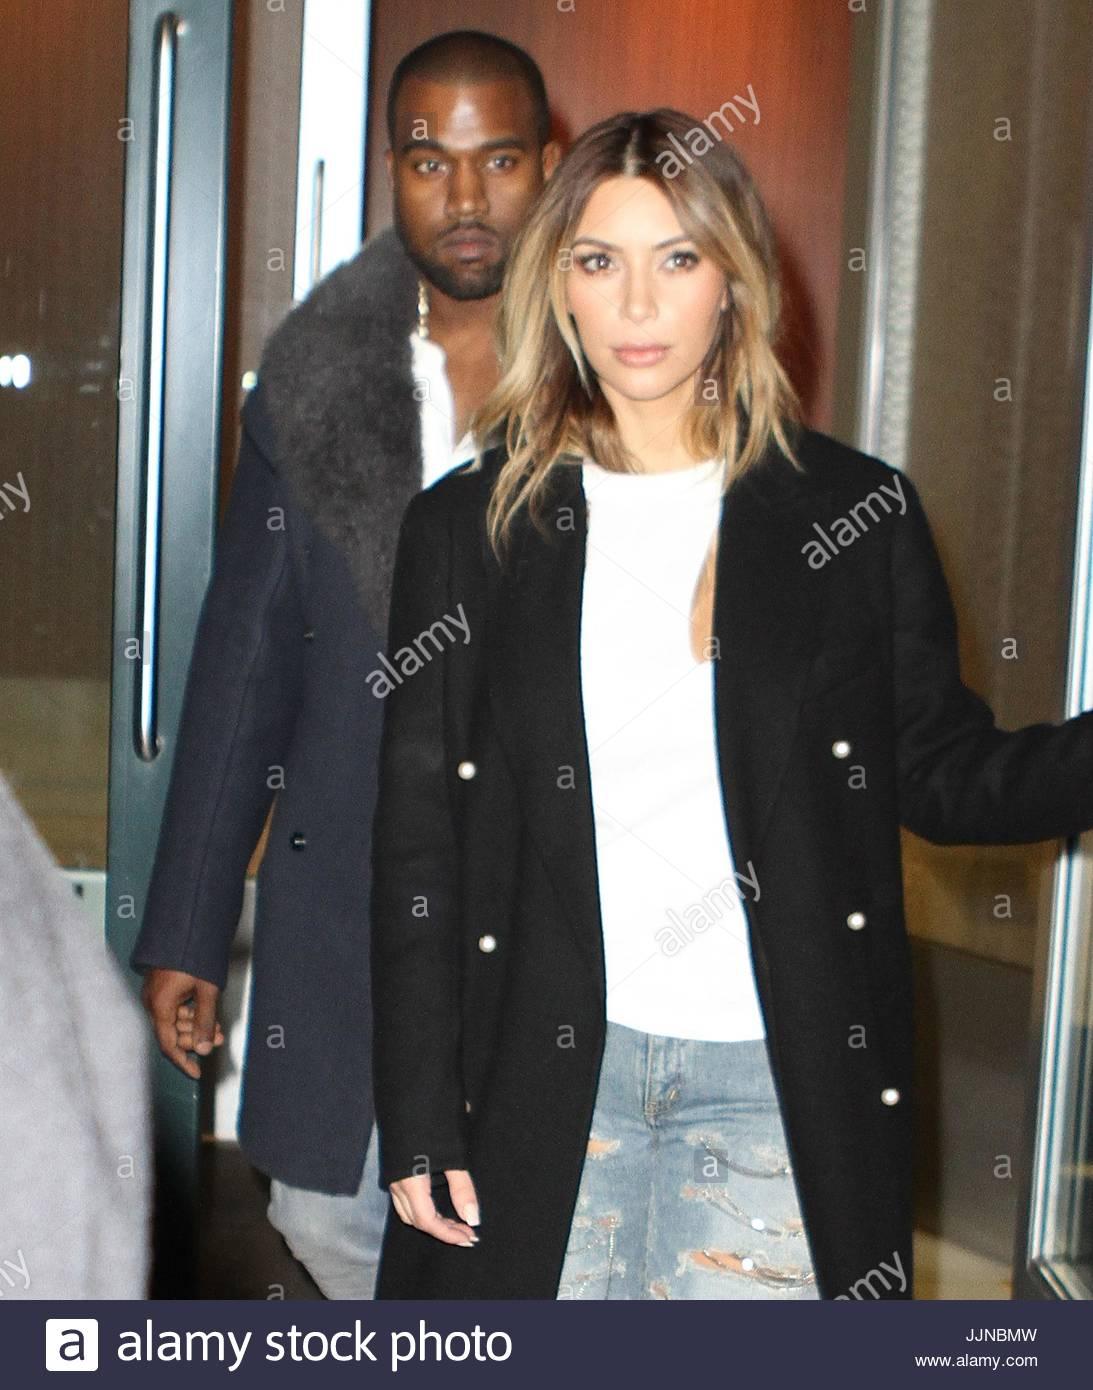 Kim Kardashian Und Kanye West Kim Kardashian Und Kanye West Galten